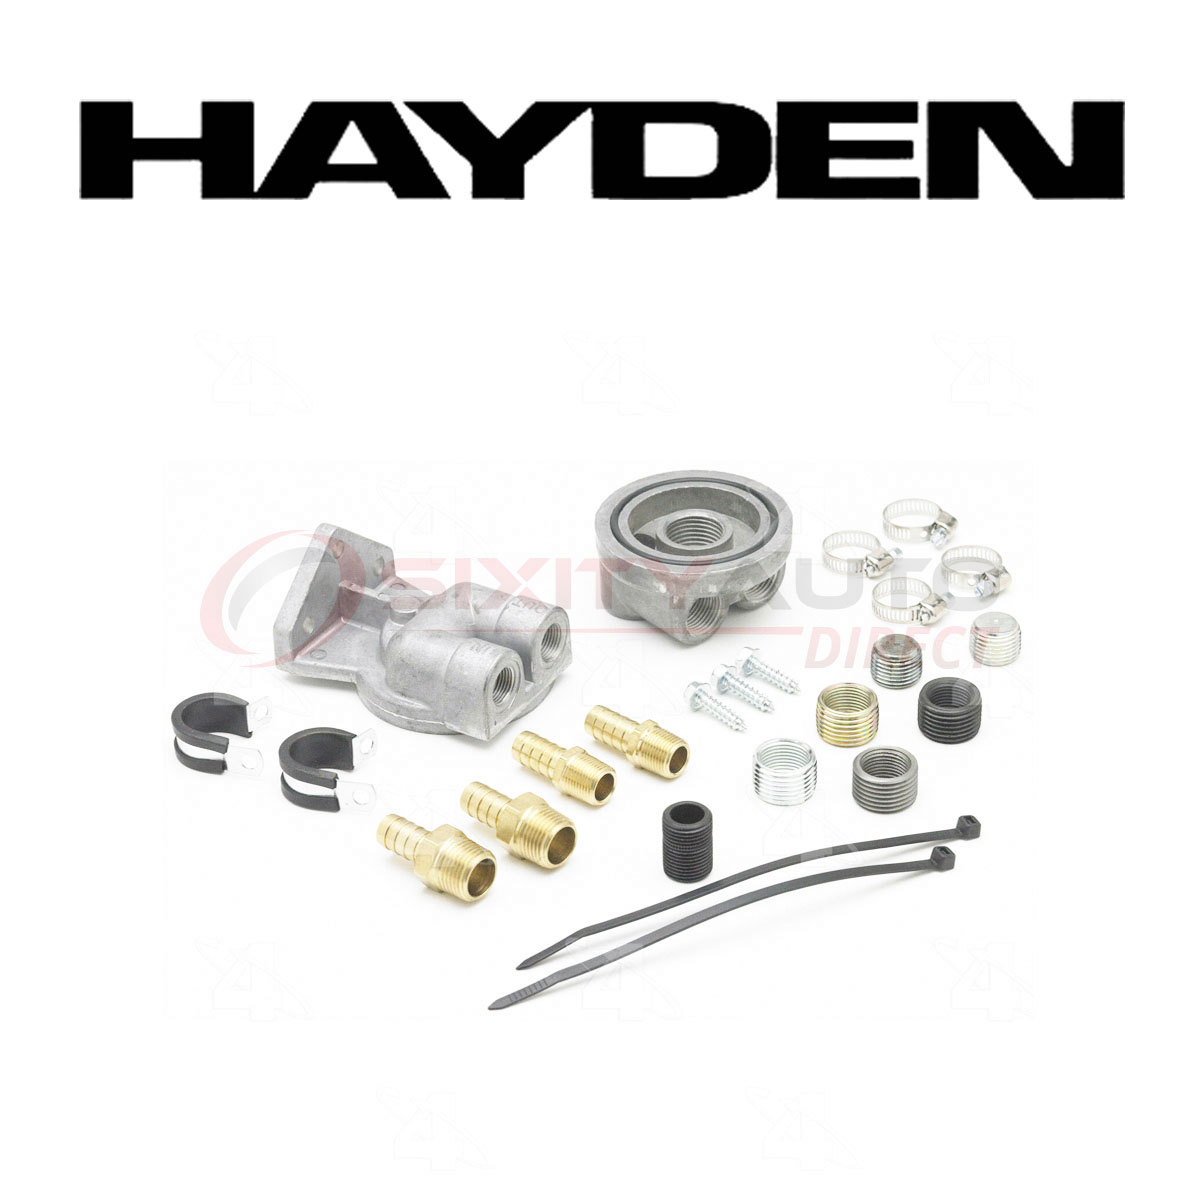 Hayden Oil Filter Remote Mounting Kit for 1996-2001